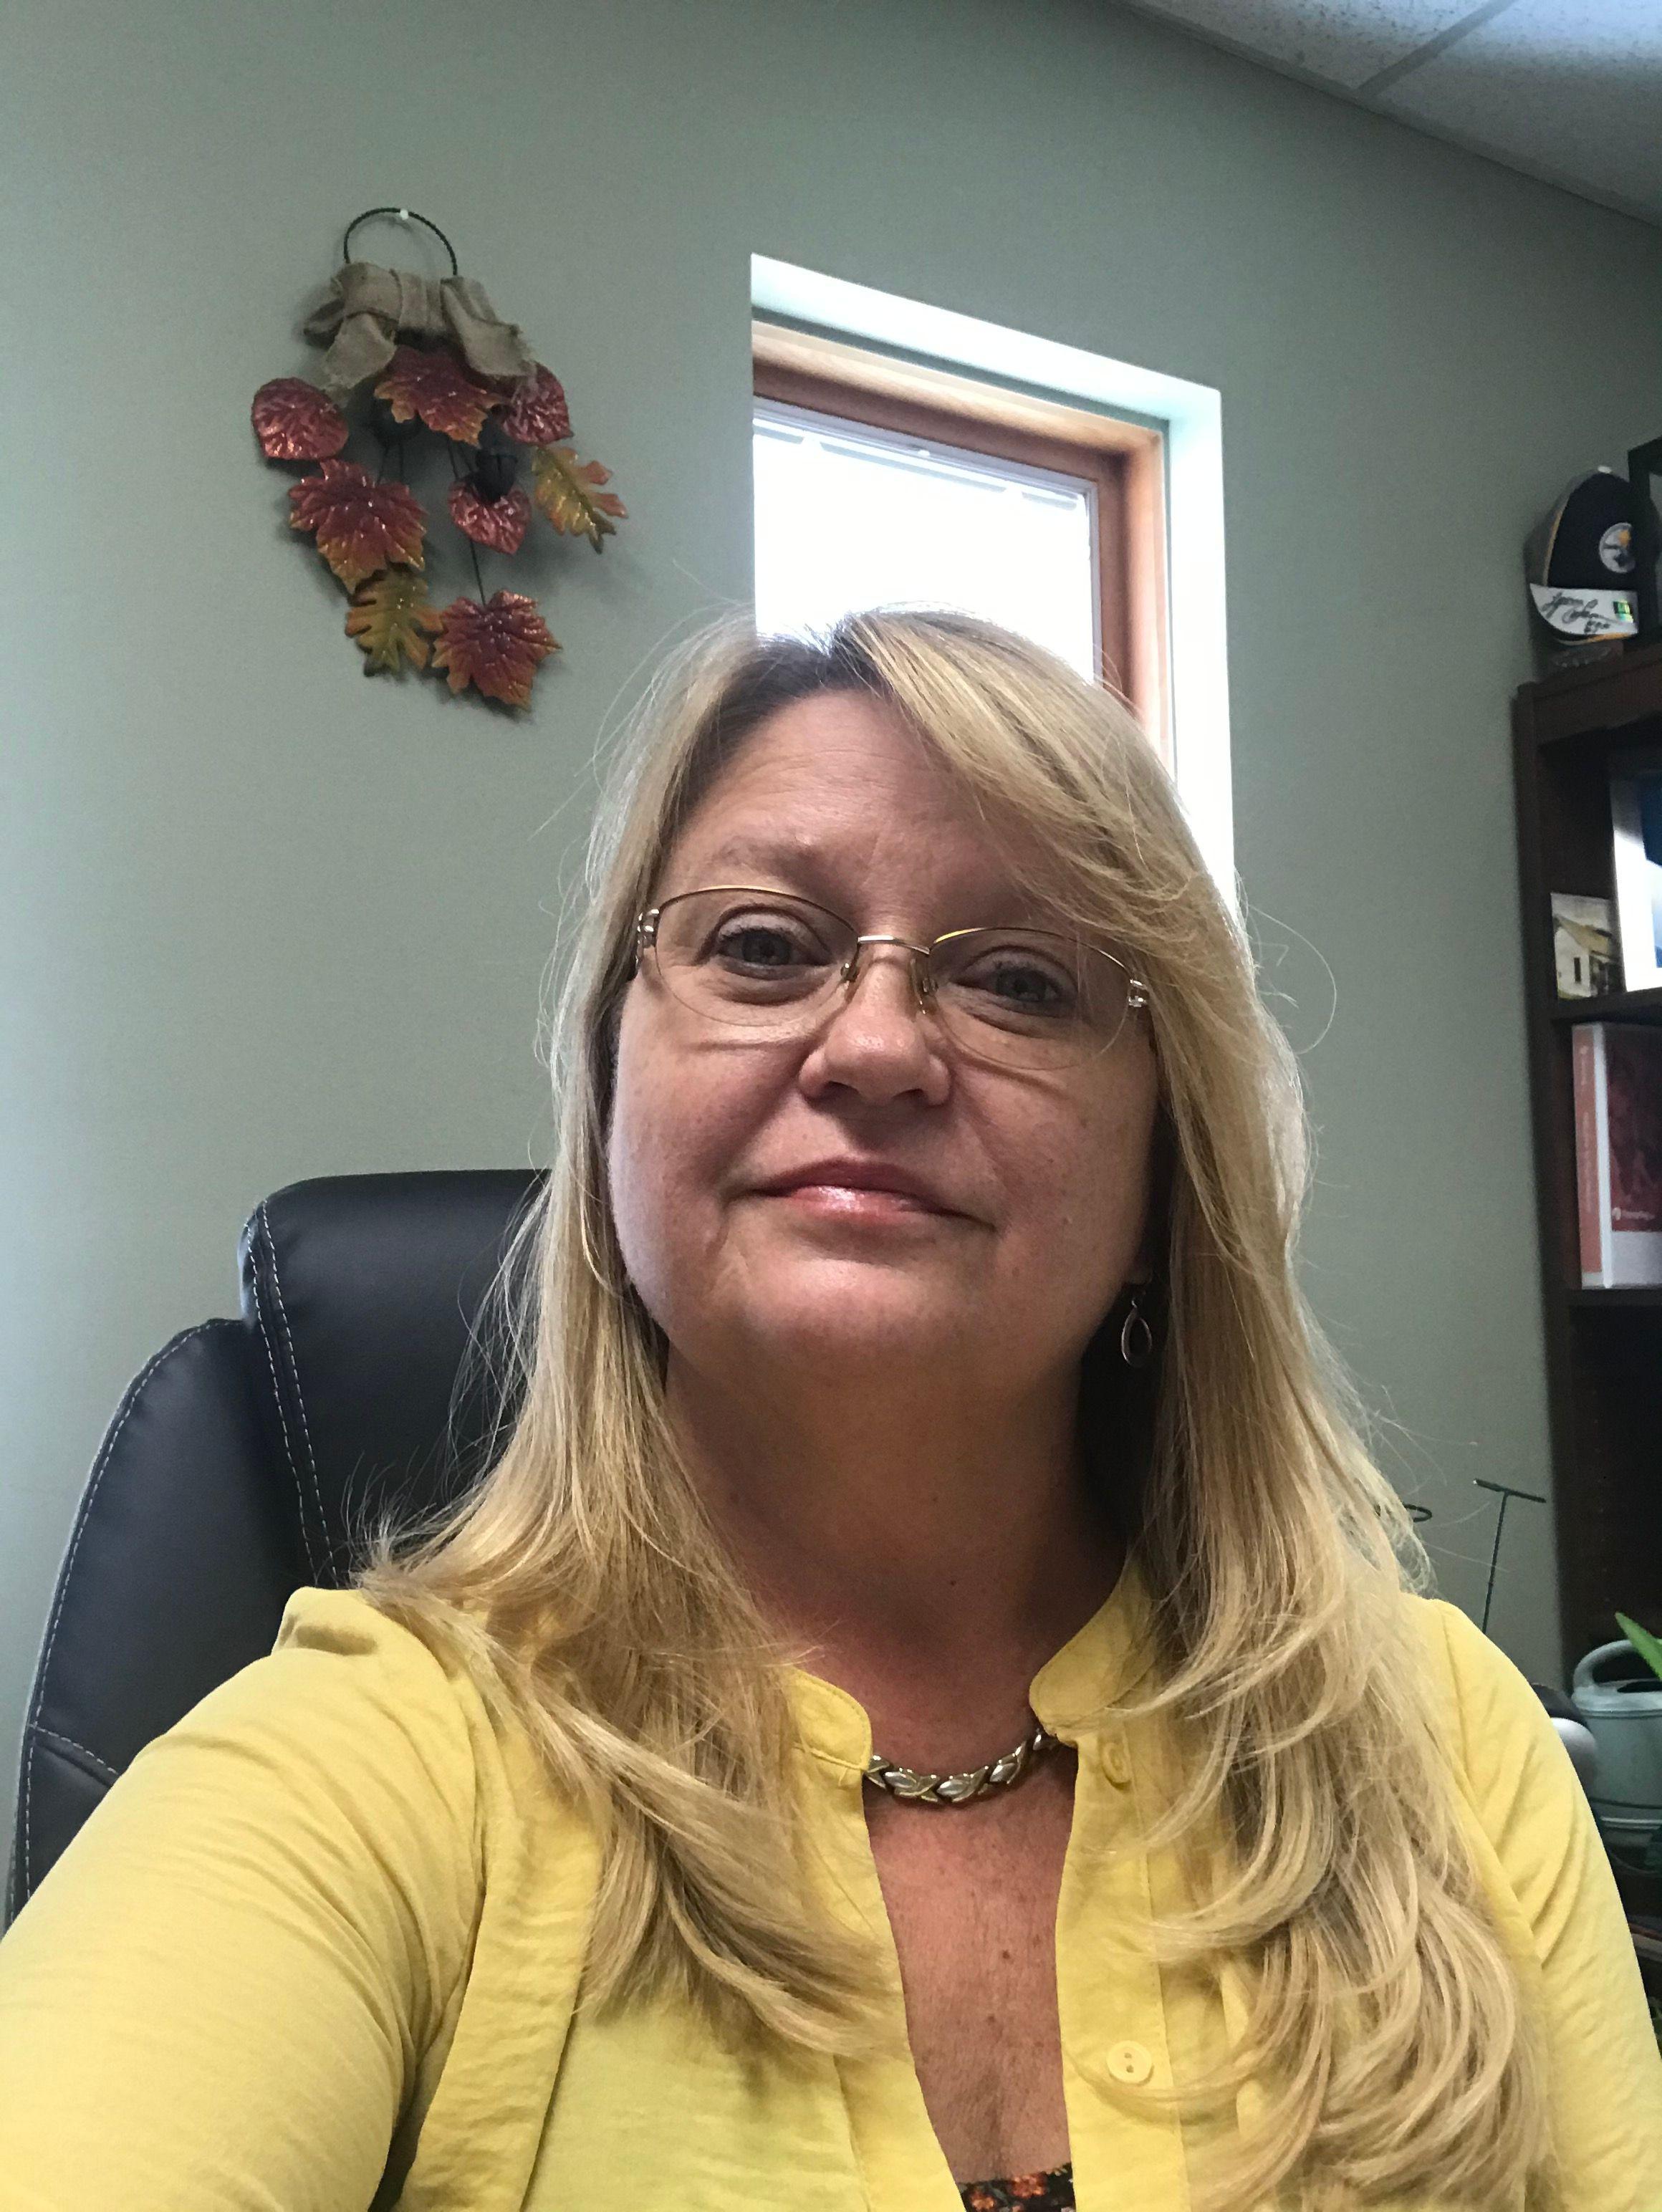 Kristy Hawthorne, District Program Administrator